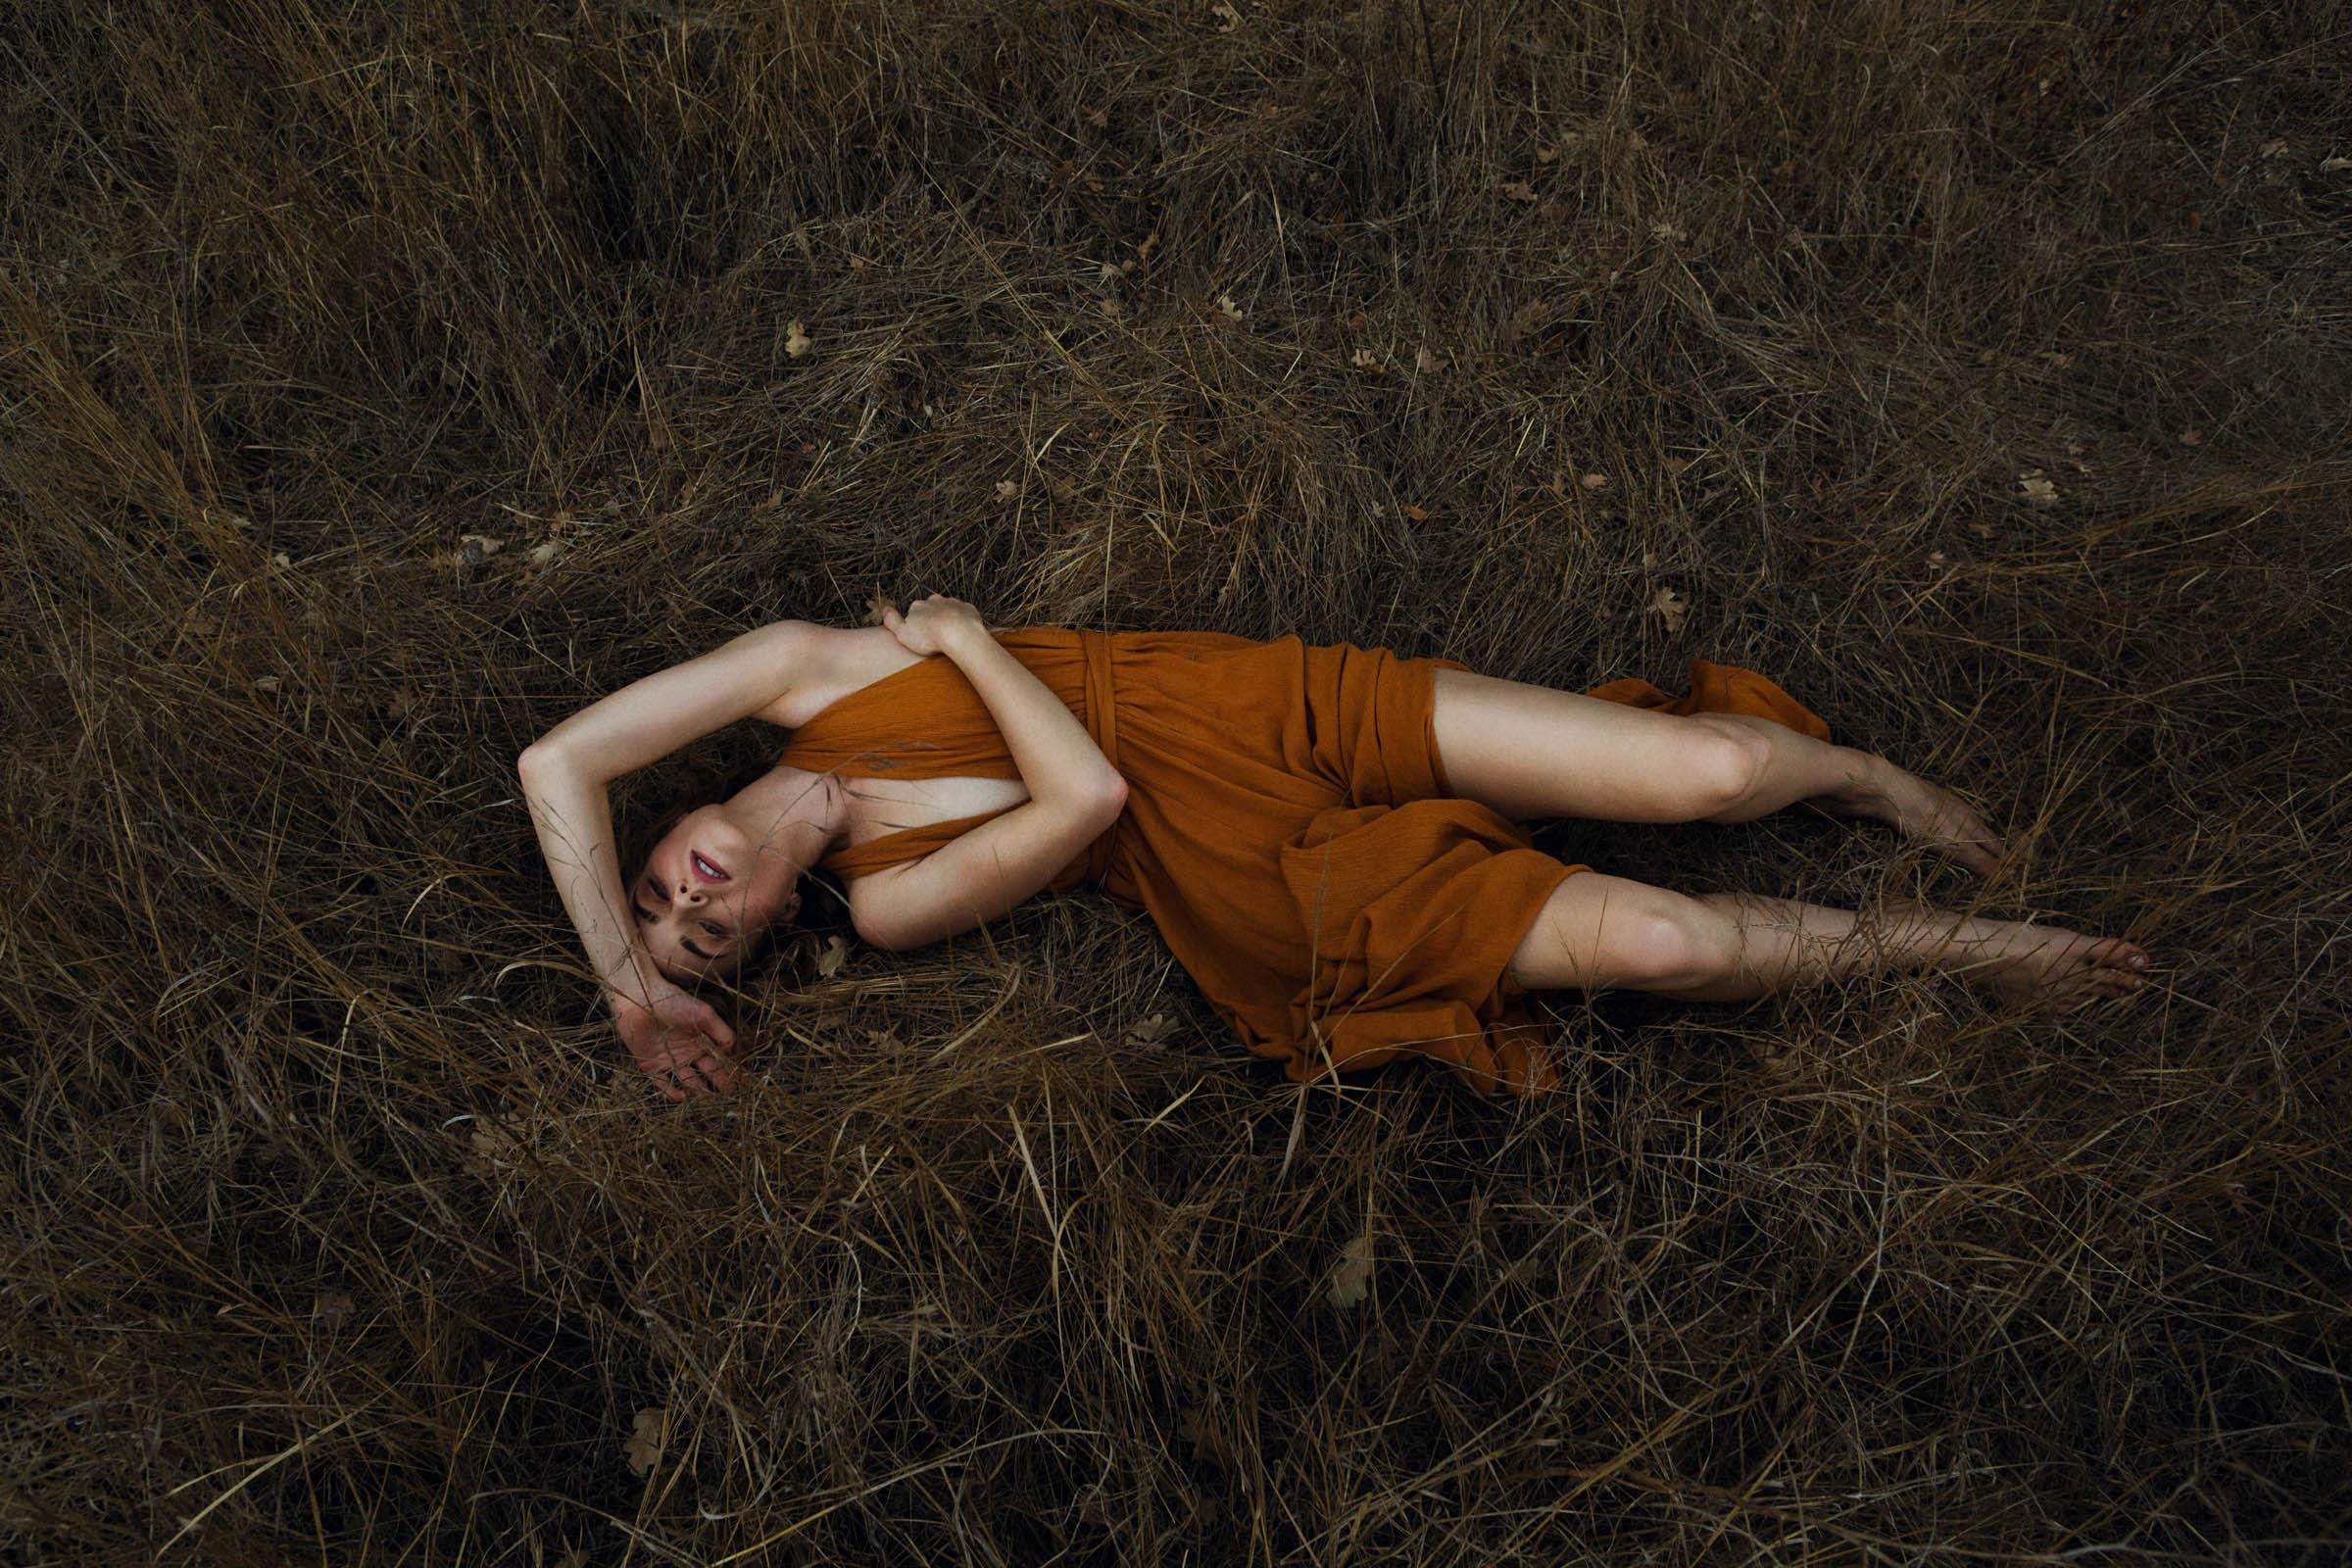 meredith-grass-012.jpg